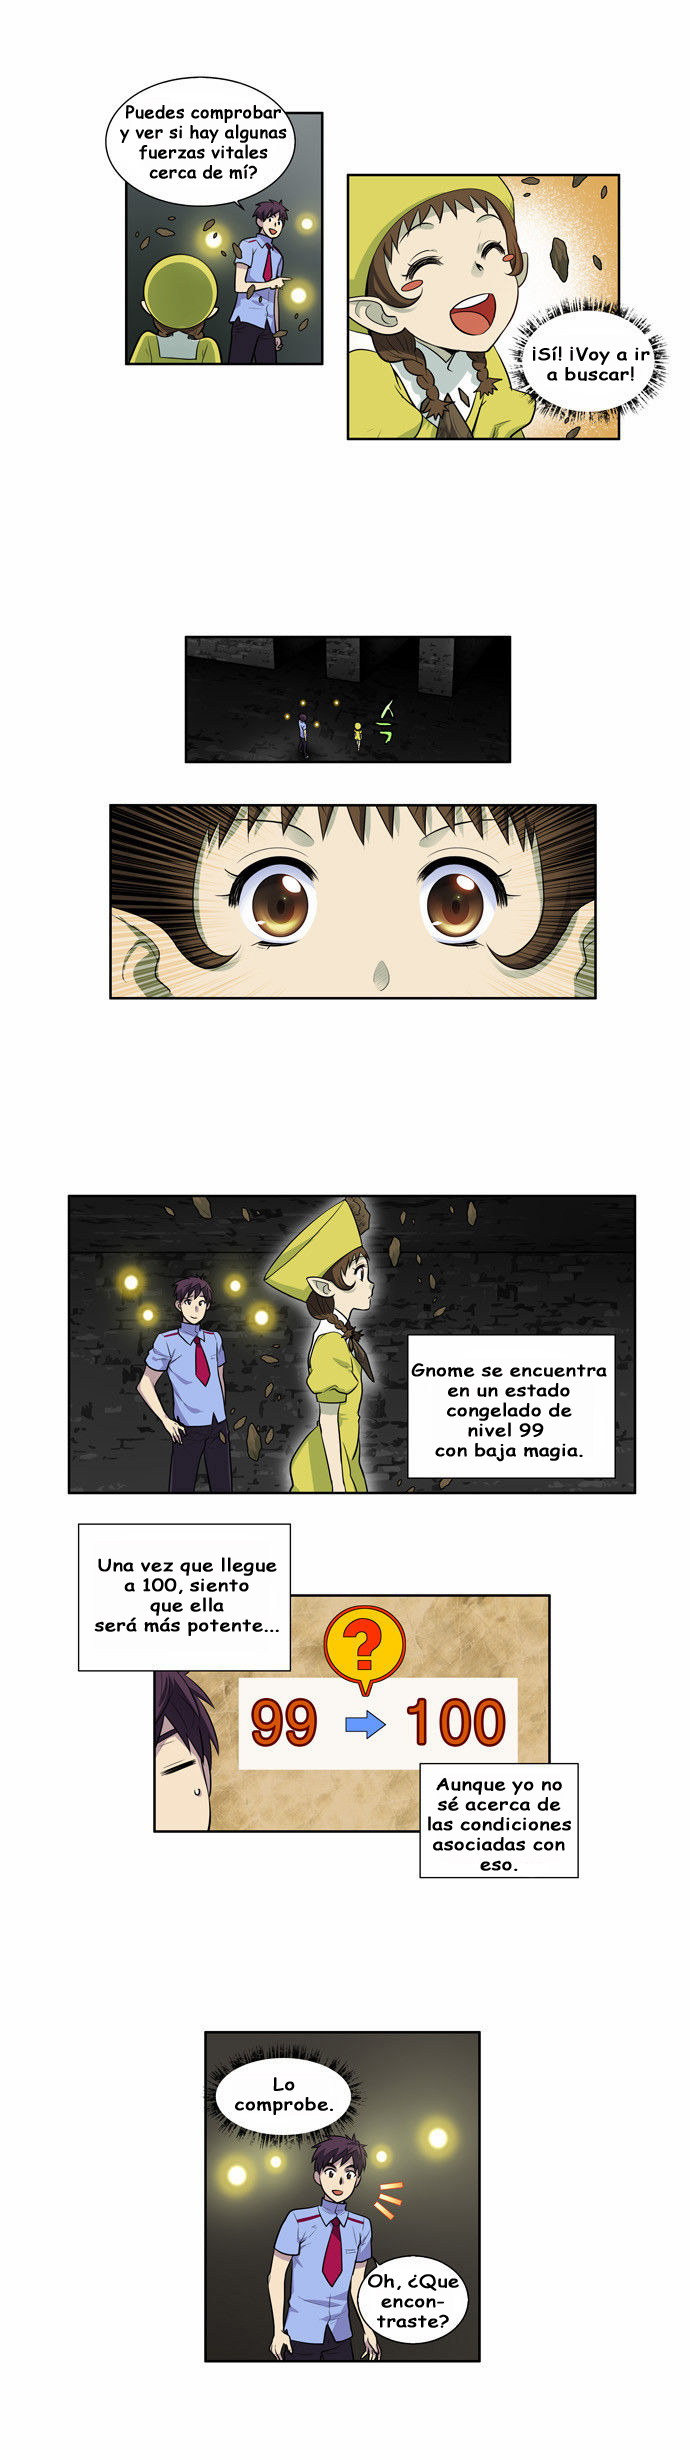 https://c5.ninemanga.com/es_manga/61/1725/396909/e78c666d9e6c8aaf2cb2044b8960c4d2.jpg Page 2